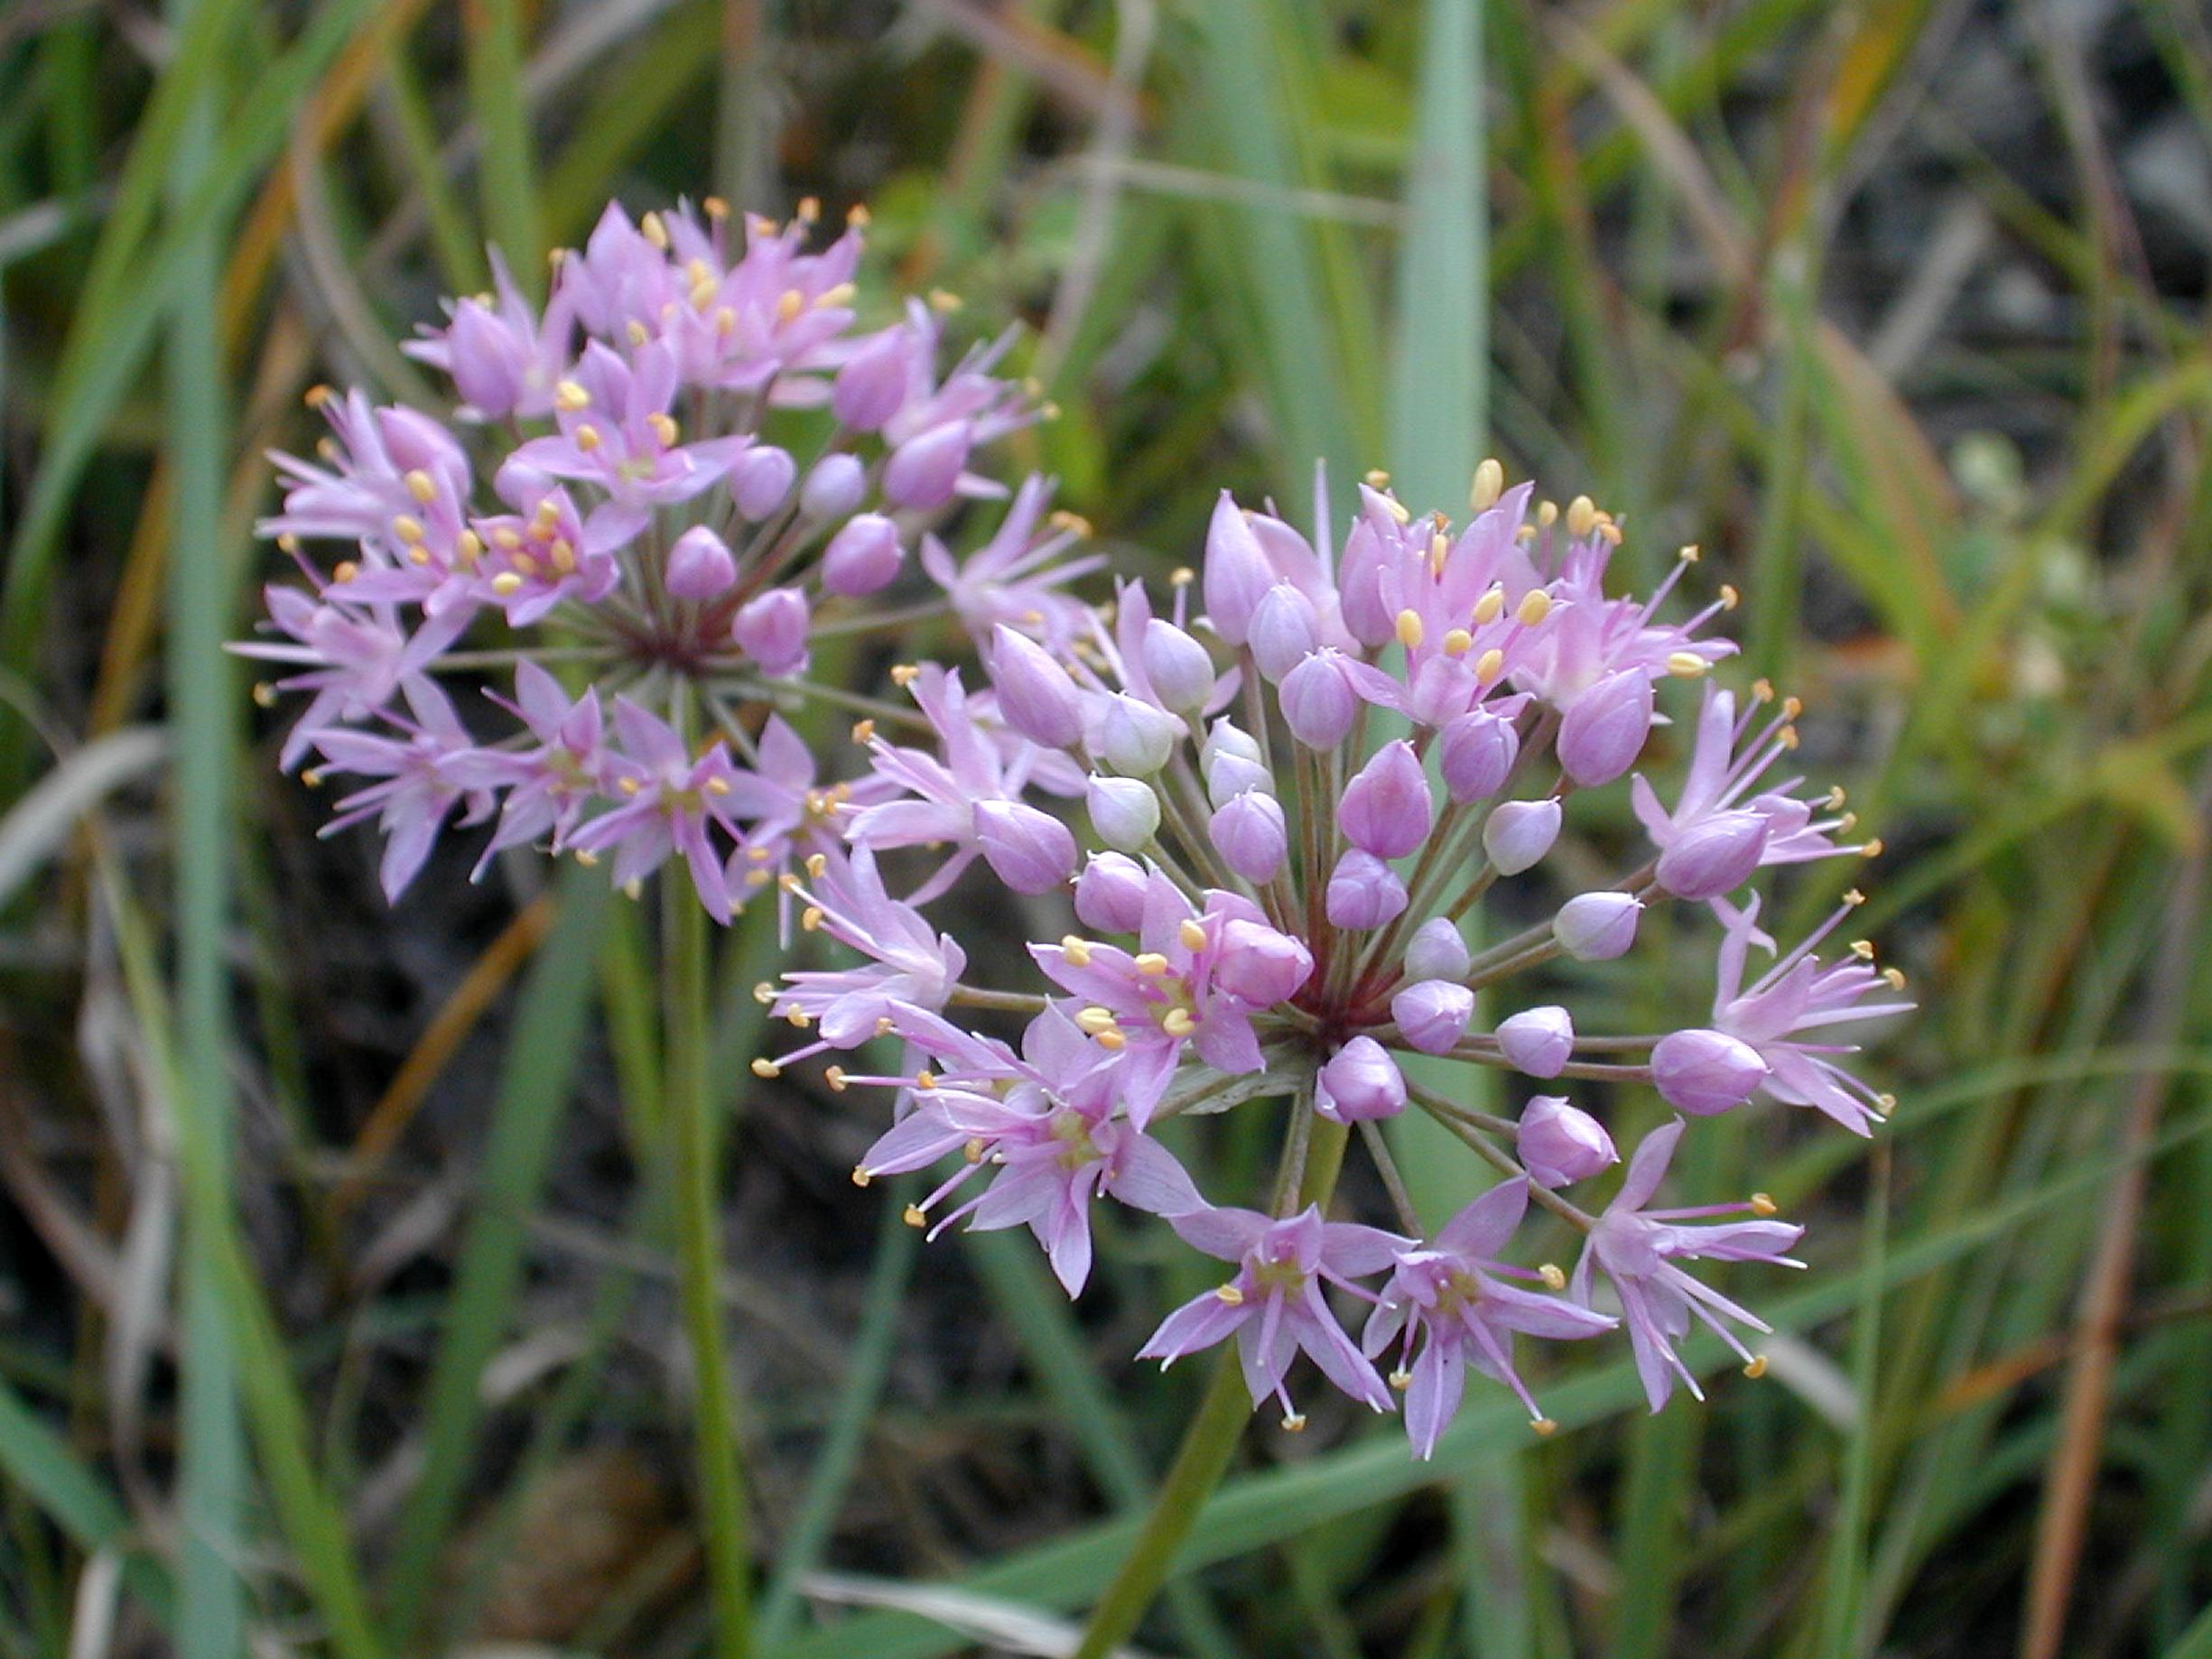 A new must have plant identification book for kansas dyck arboretum pinkwildonion mightylinksfo